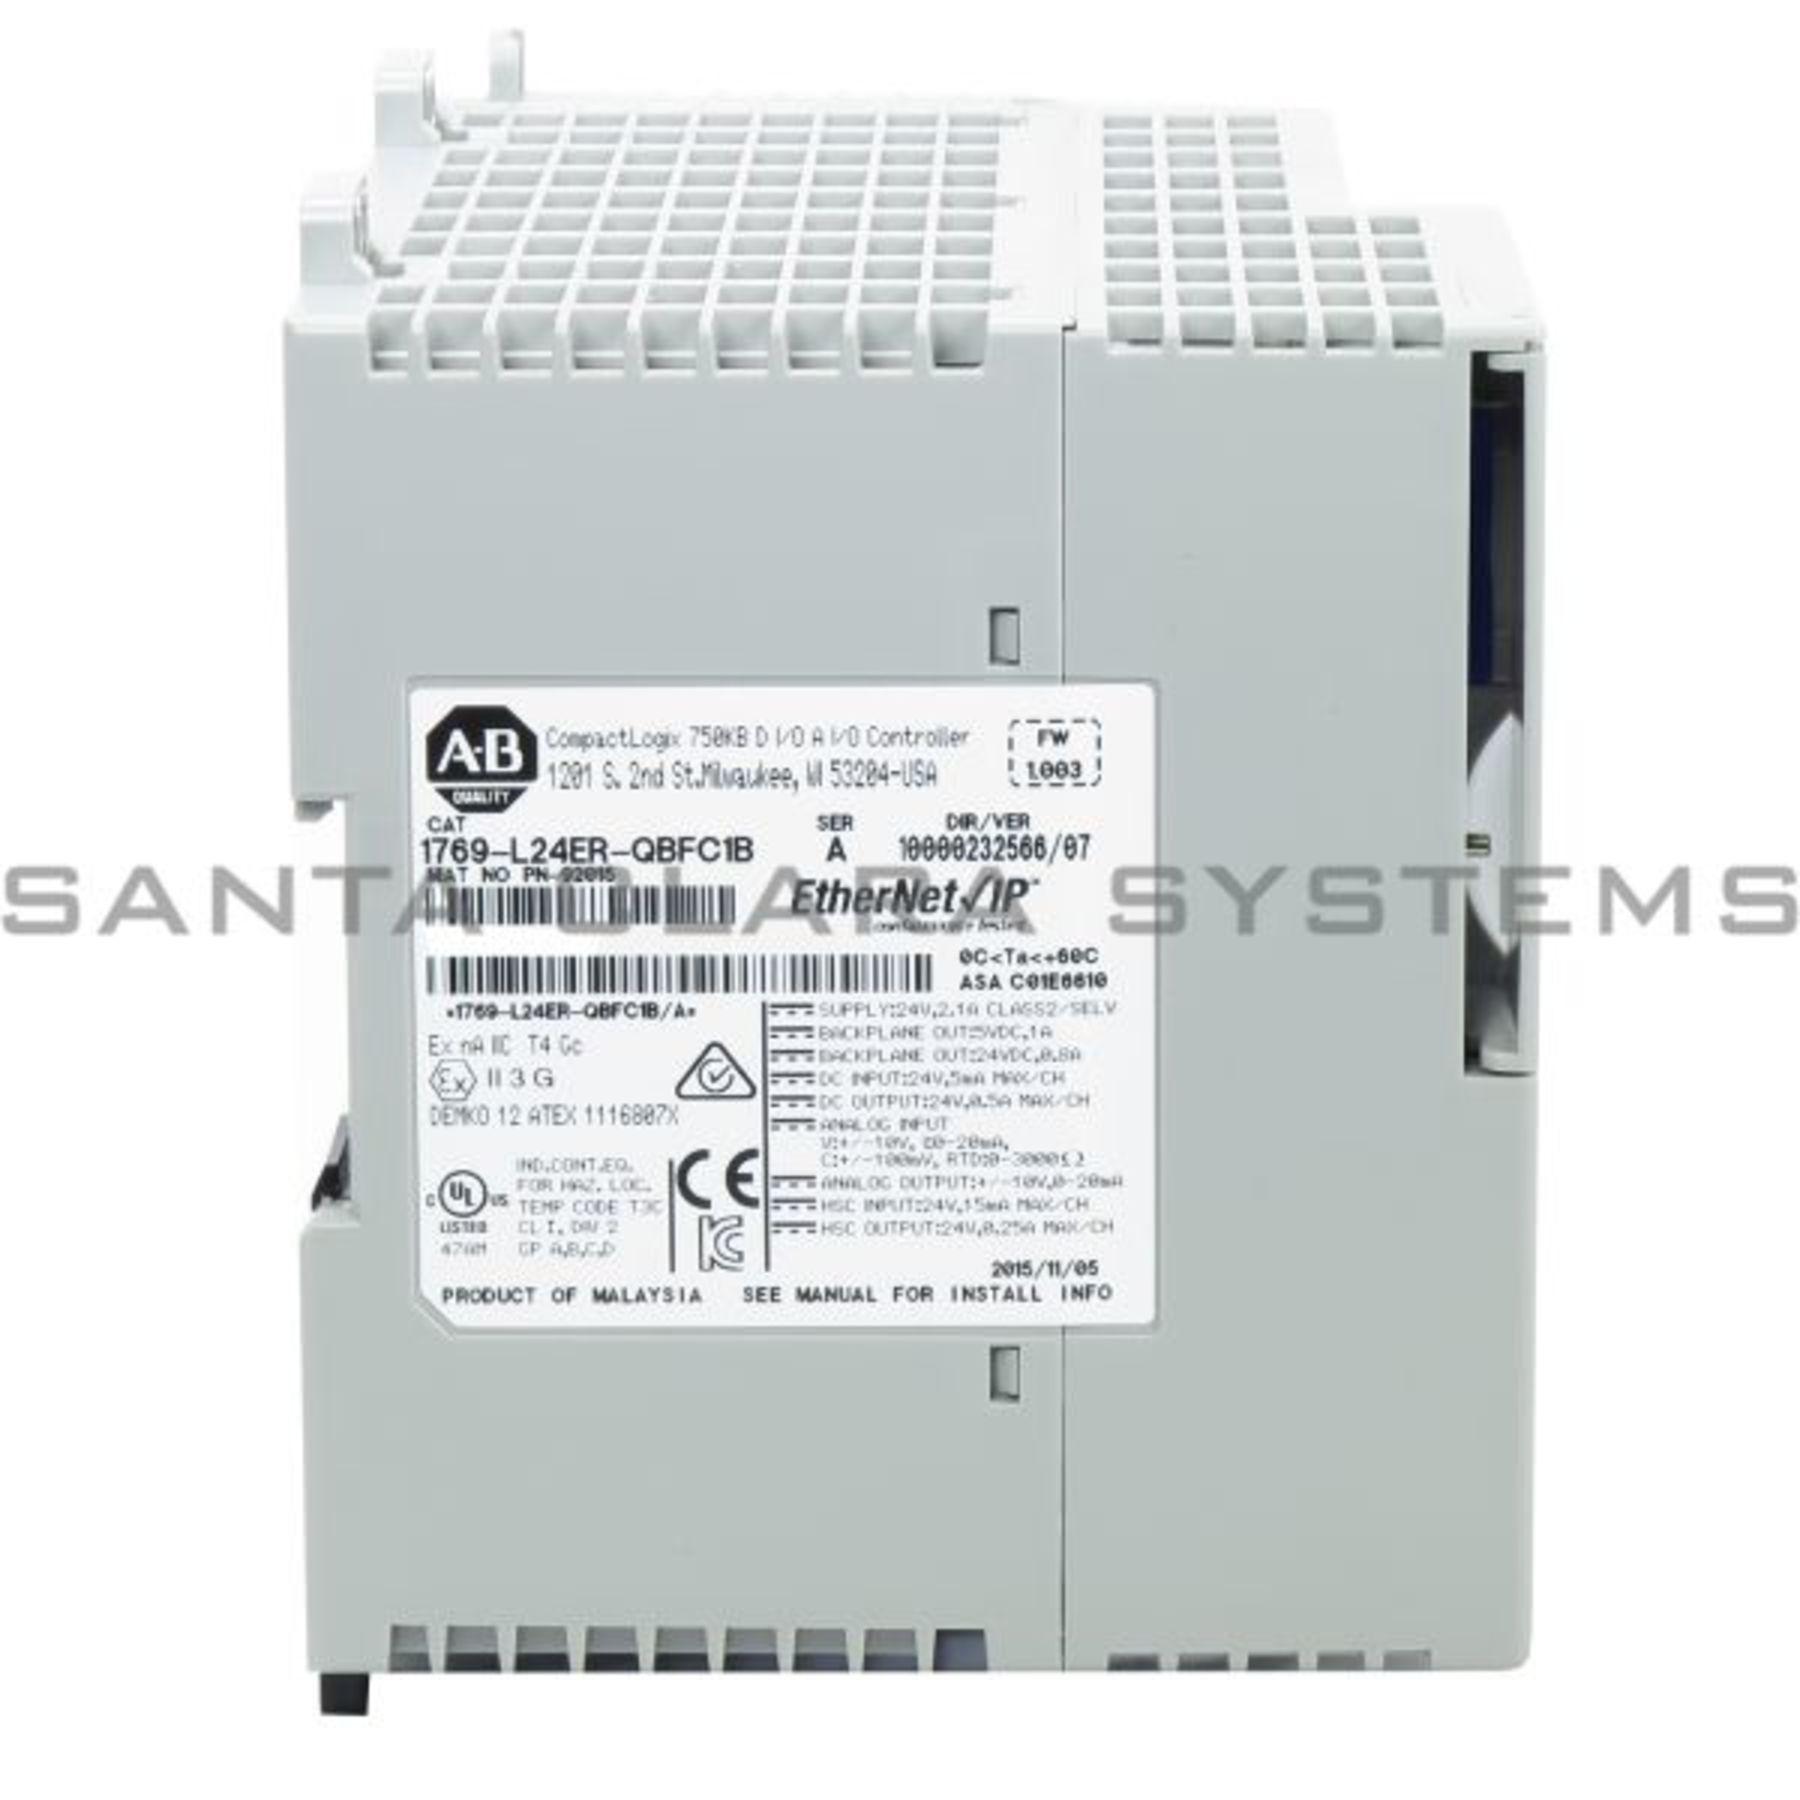 Allen Bradley 1769 L24ER QBFC1B Controller Product Image